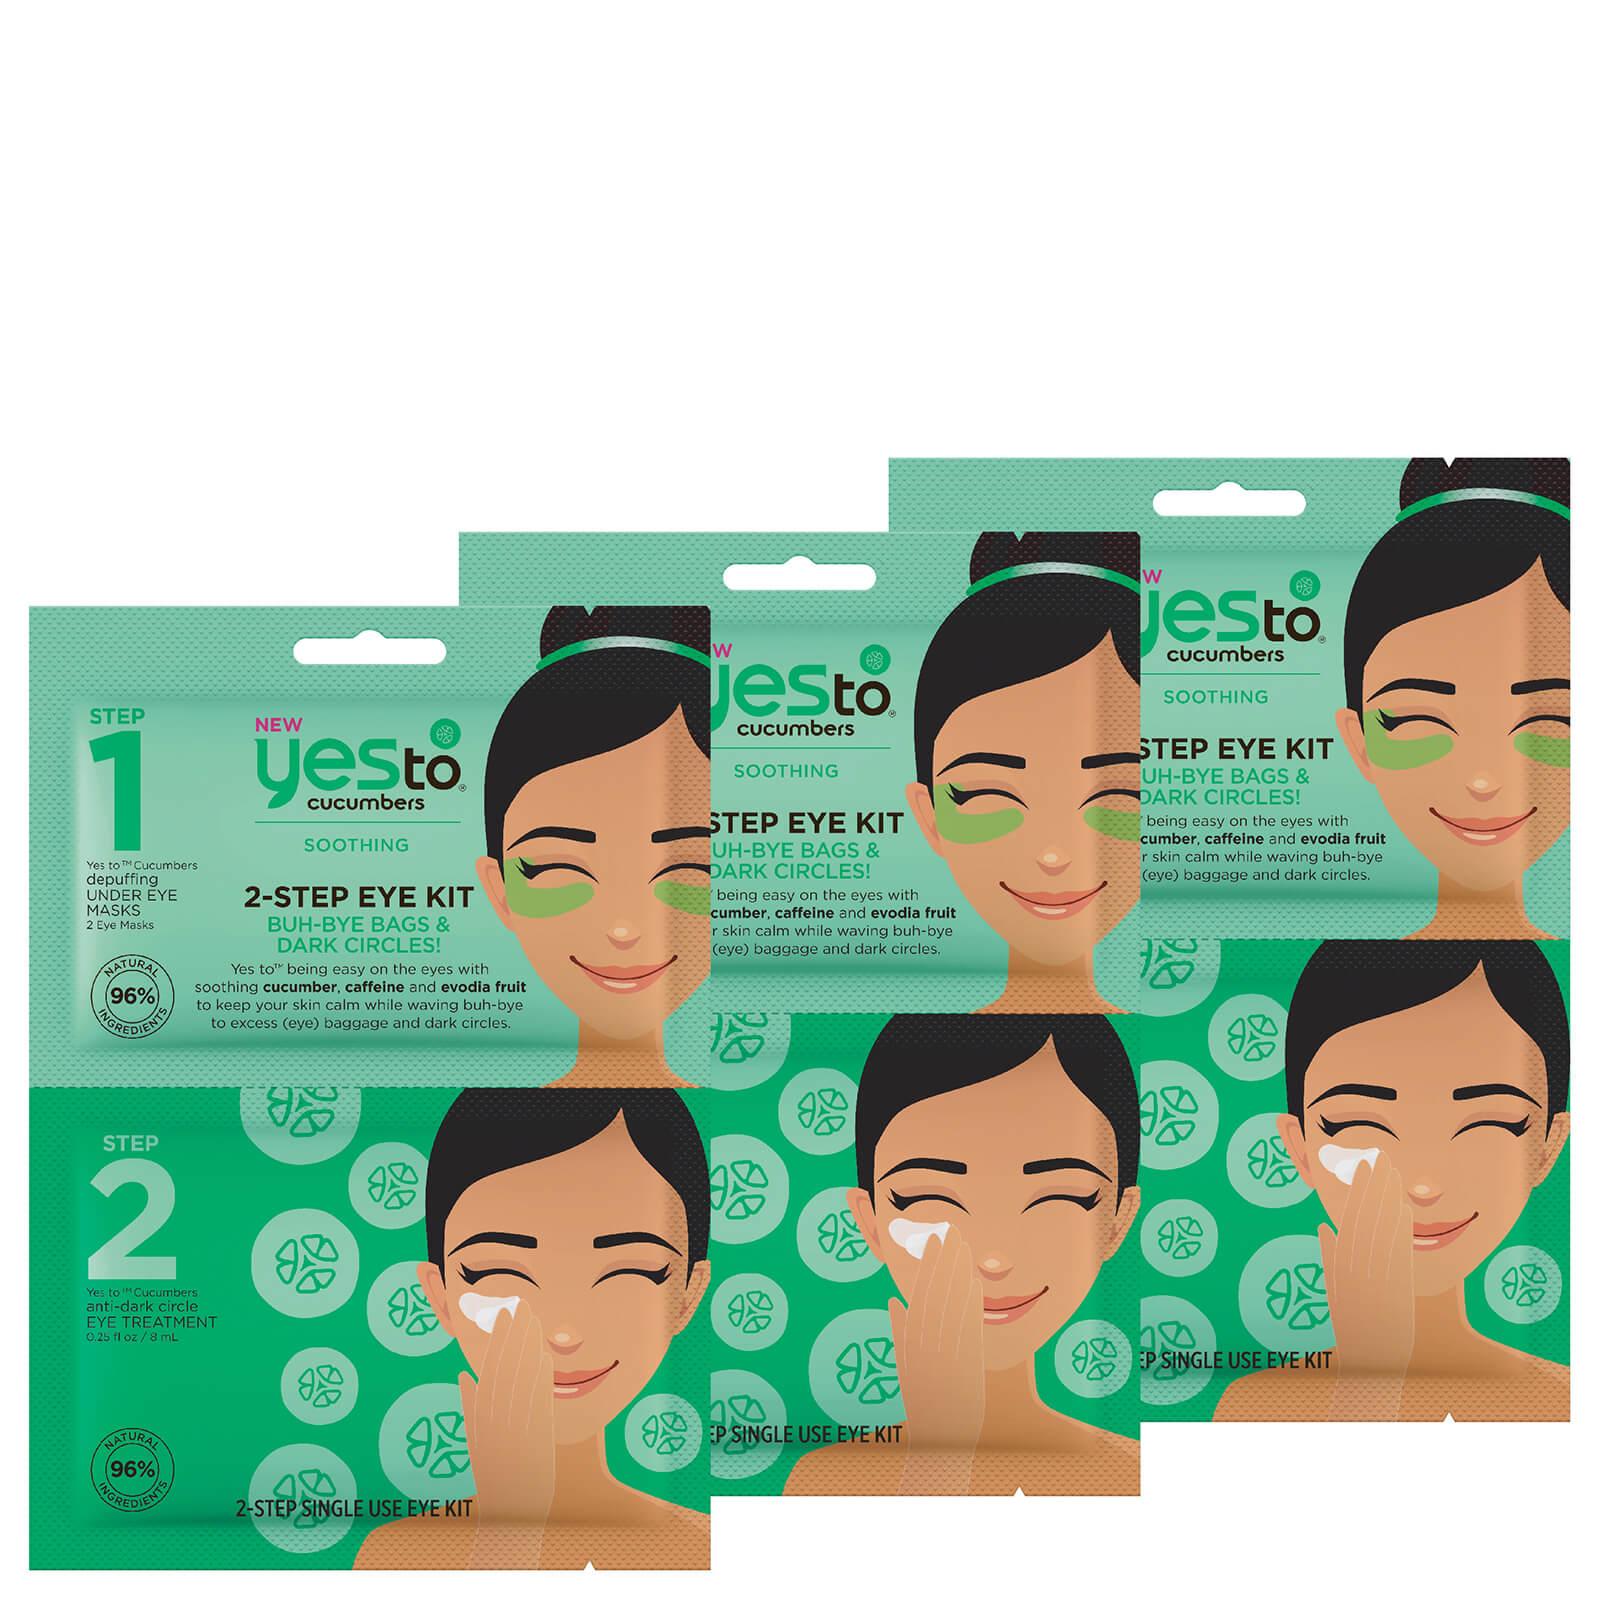 Купить Yes to Cucumbers 2-Step Eye Kit: Buh-Bye Bags and Dark Circles! (Pack of 3)